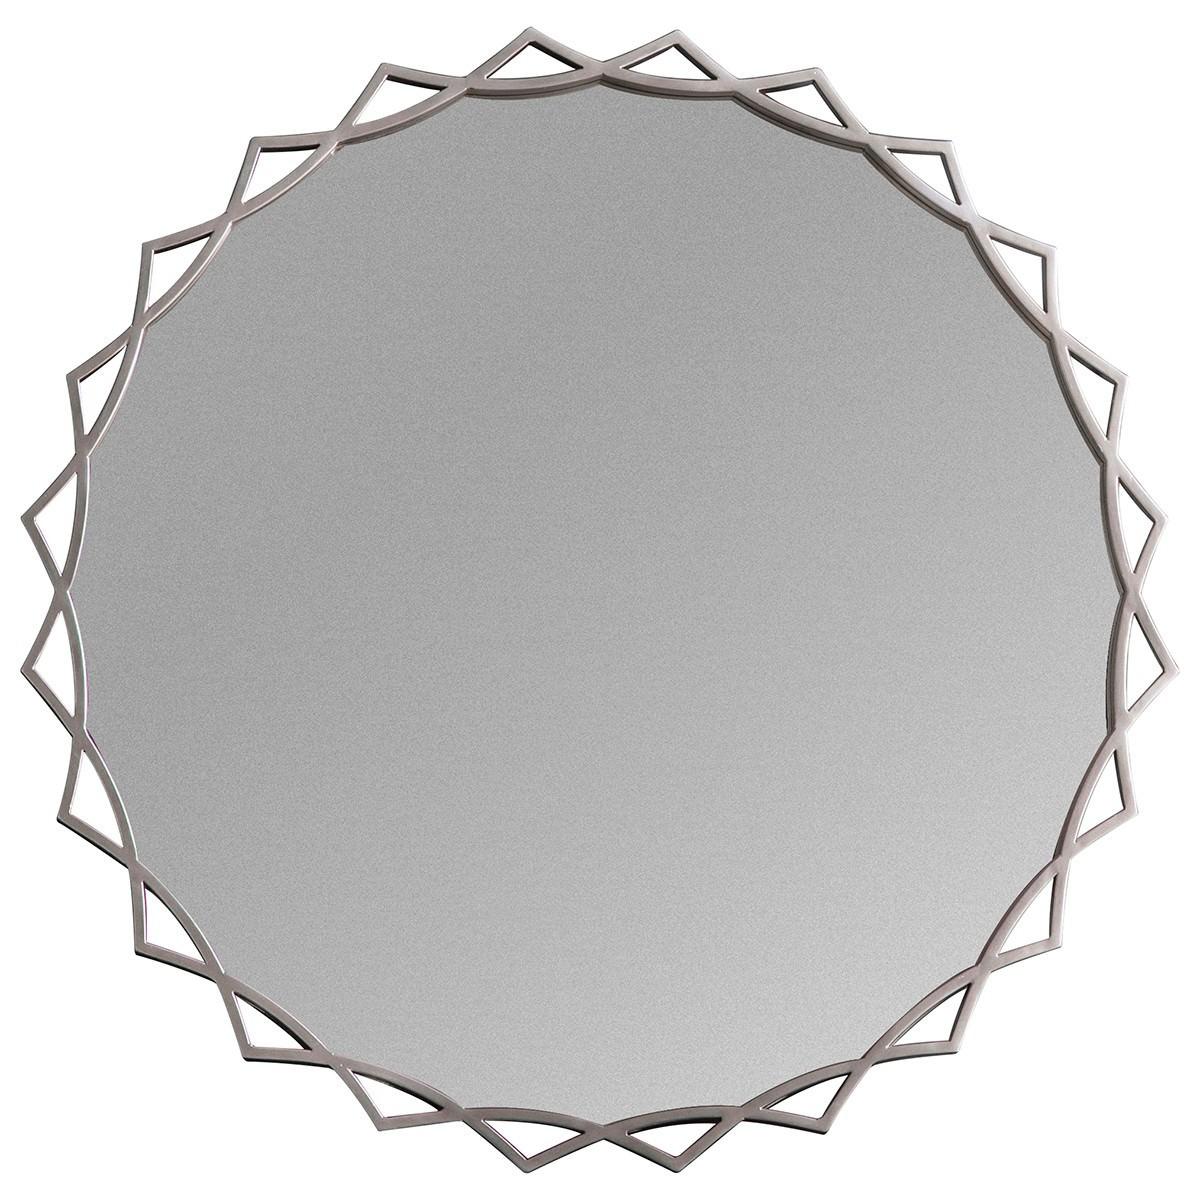 Nala Metal Frame Round Wall Mirror, 92cm, Silver